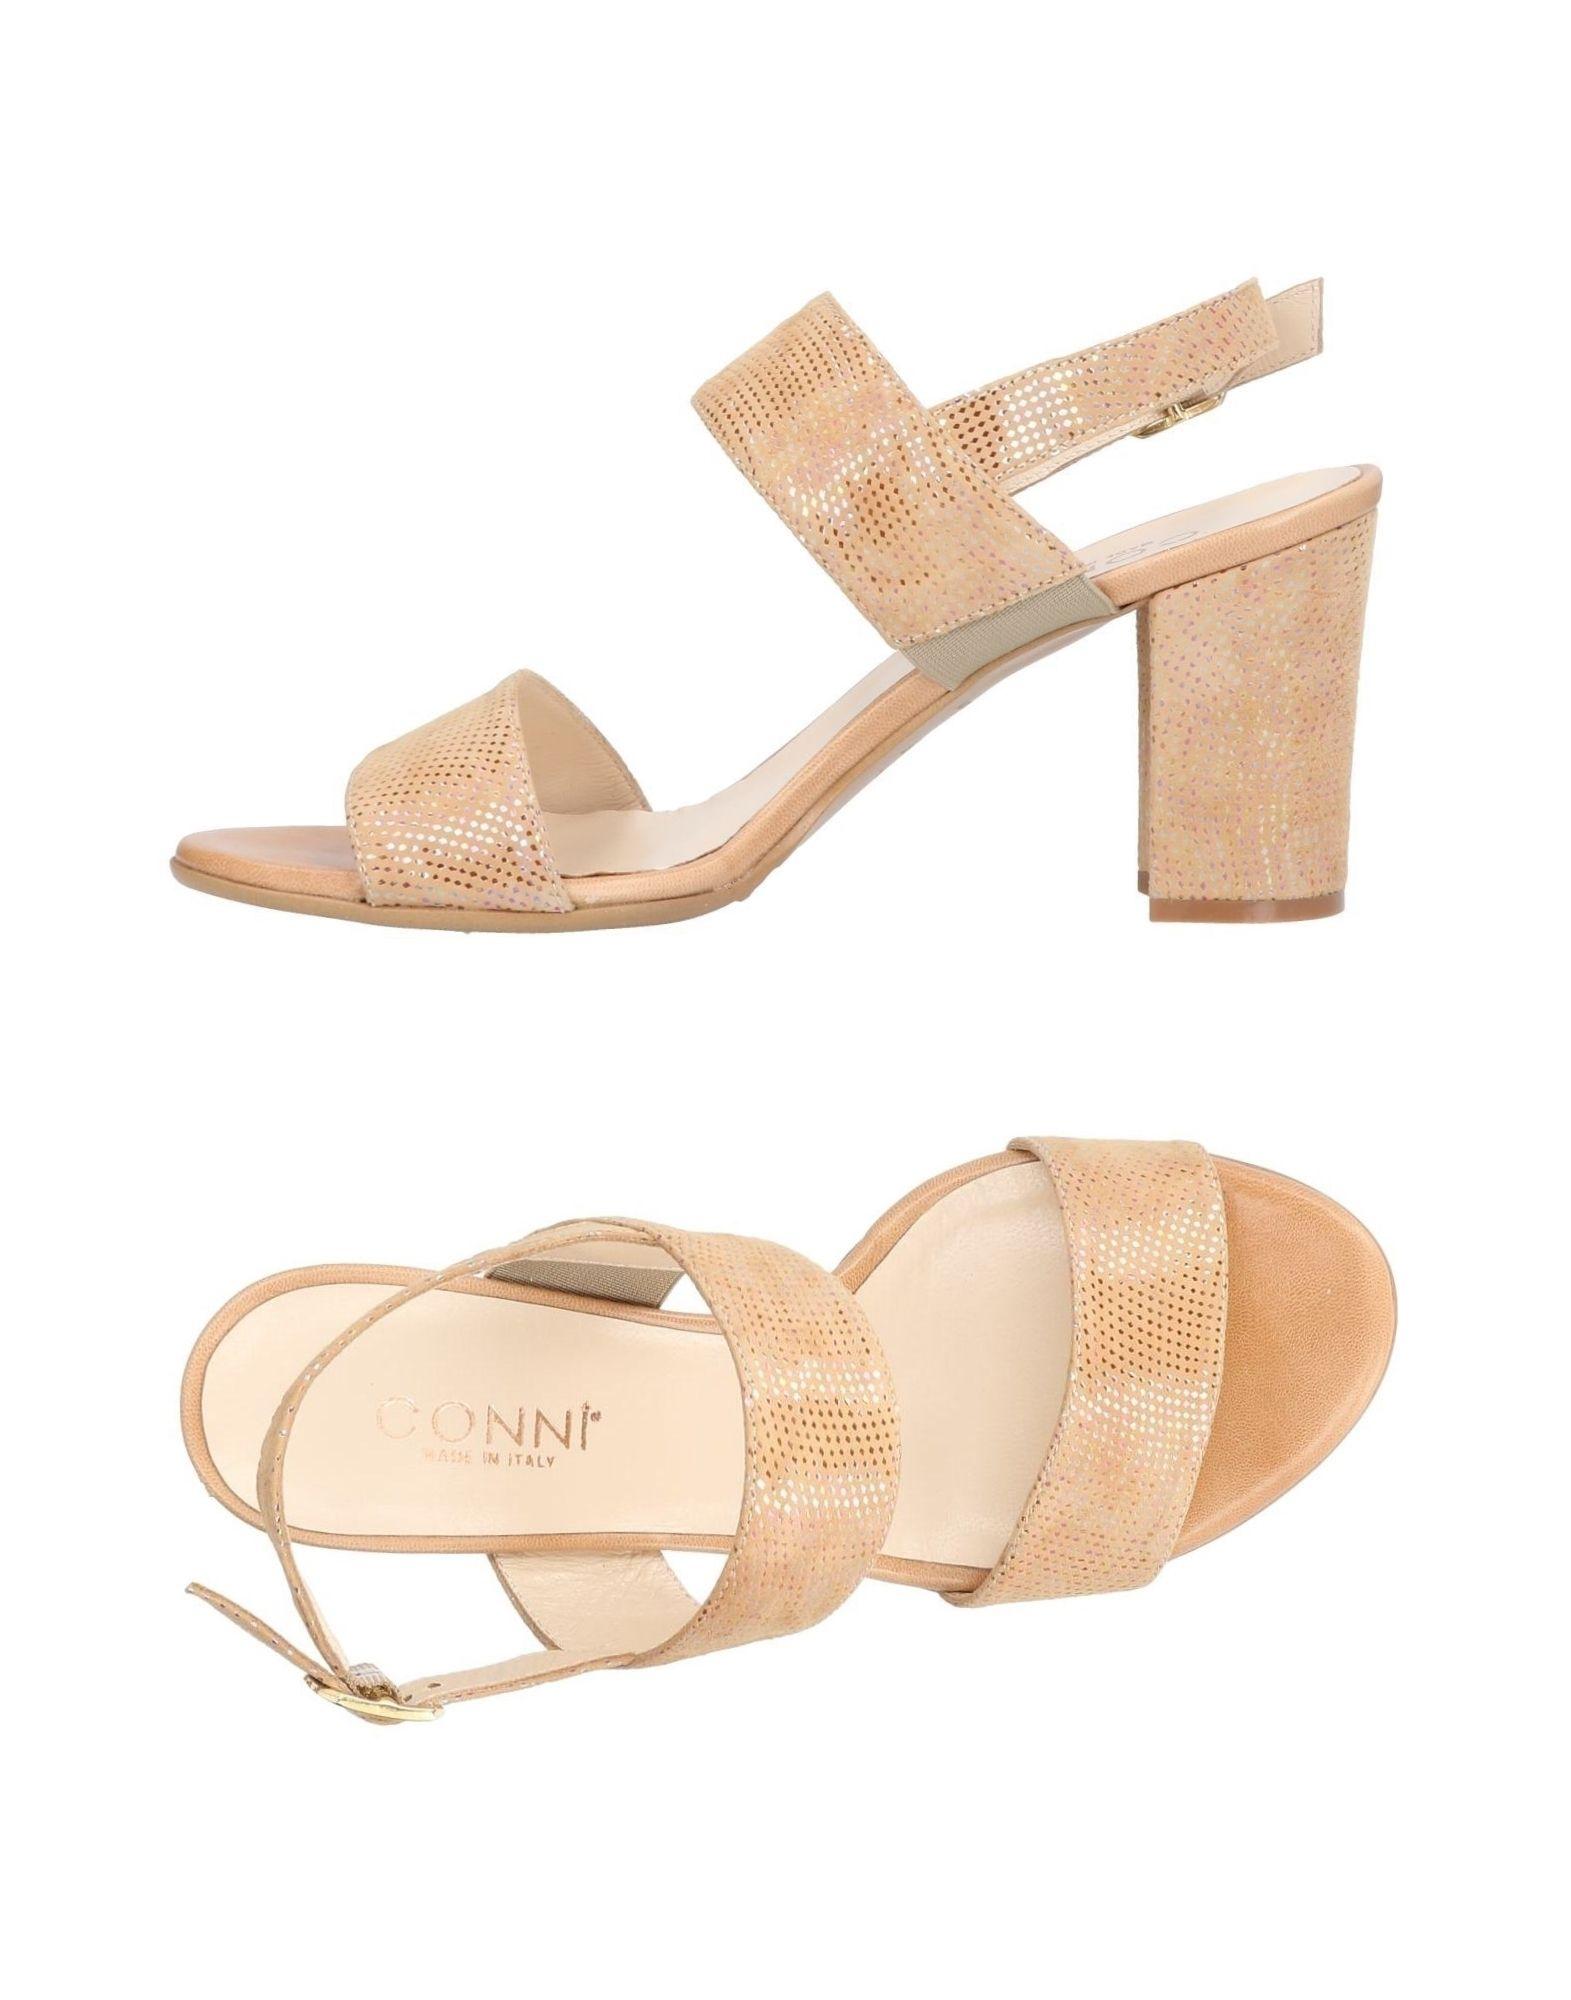 Conni Sandalen Damen  11412500KJ Gute Qualität beliebte Schuhe